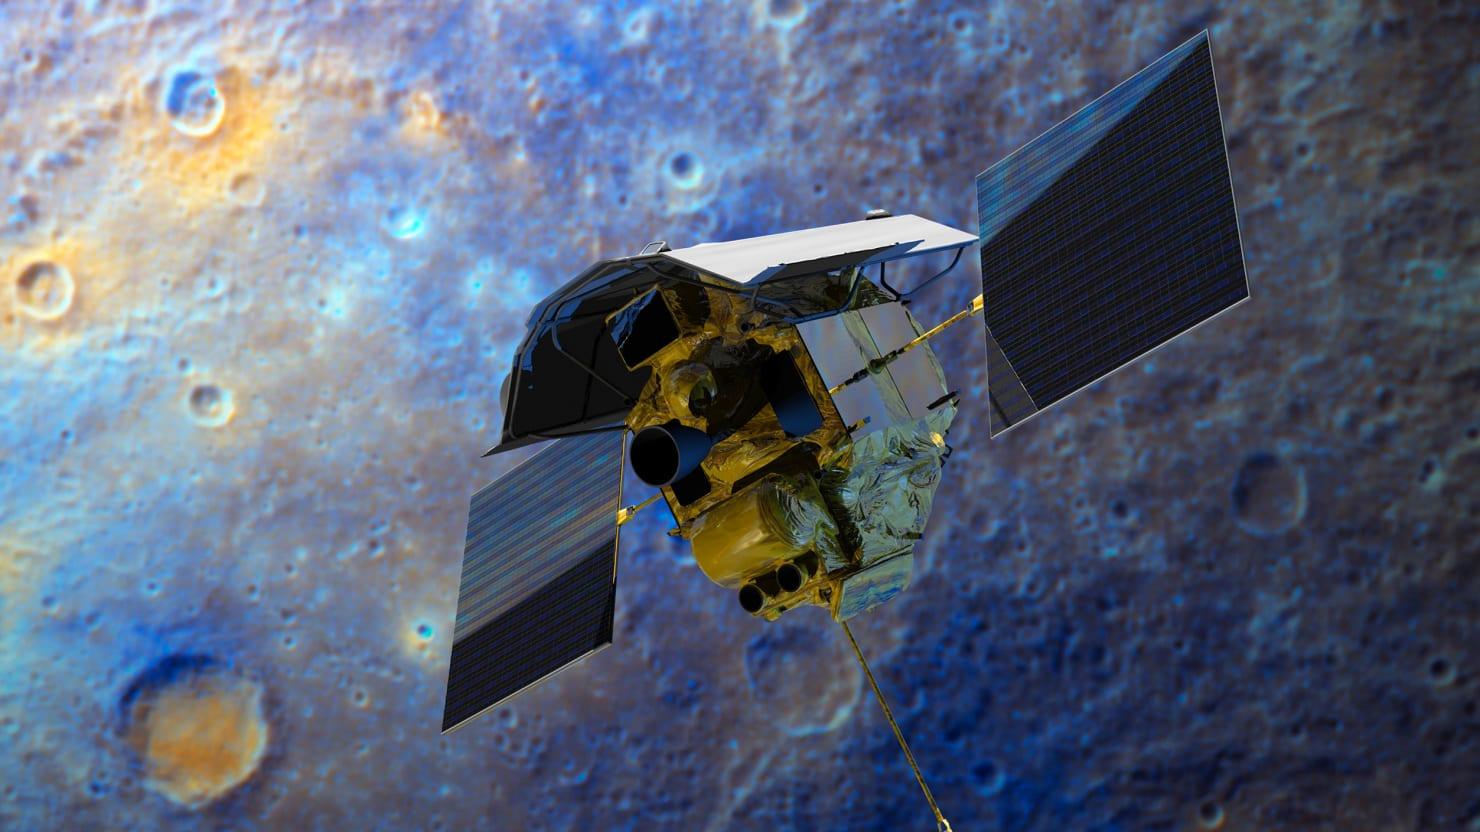 messenger space probe - photo #7